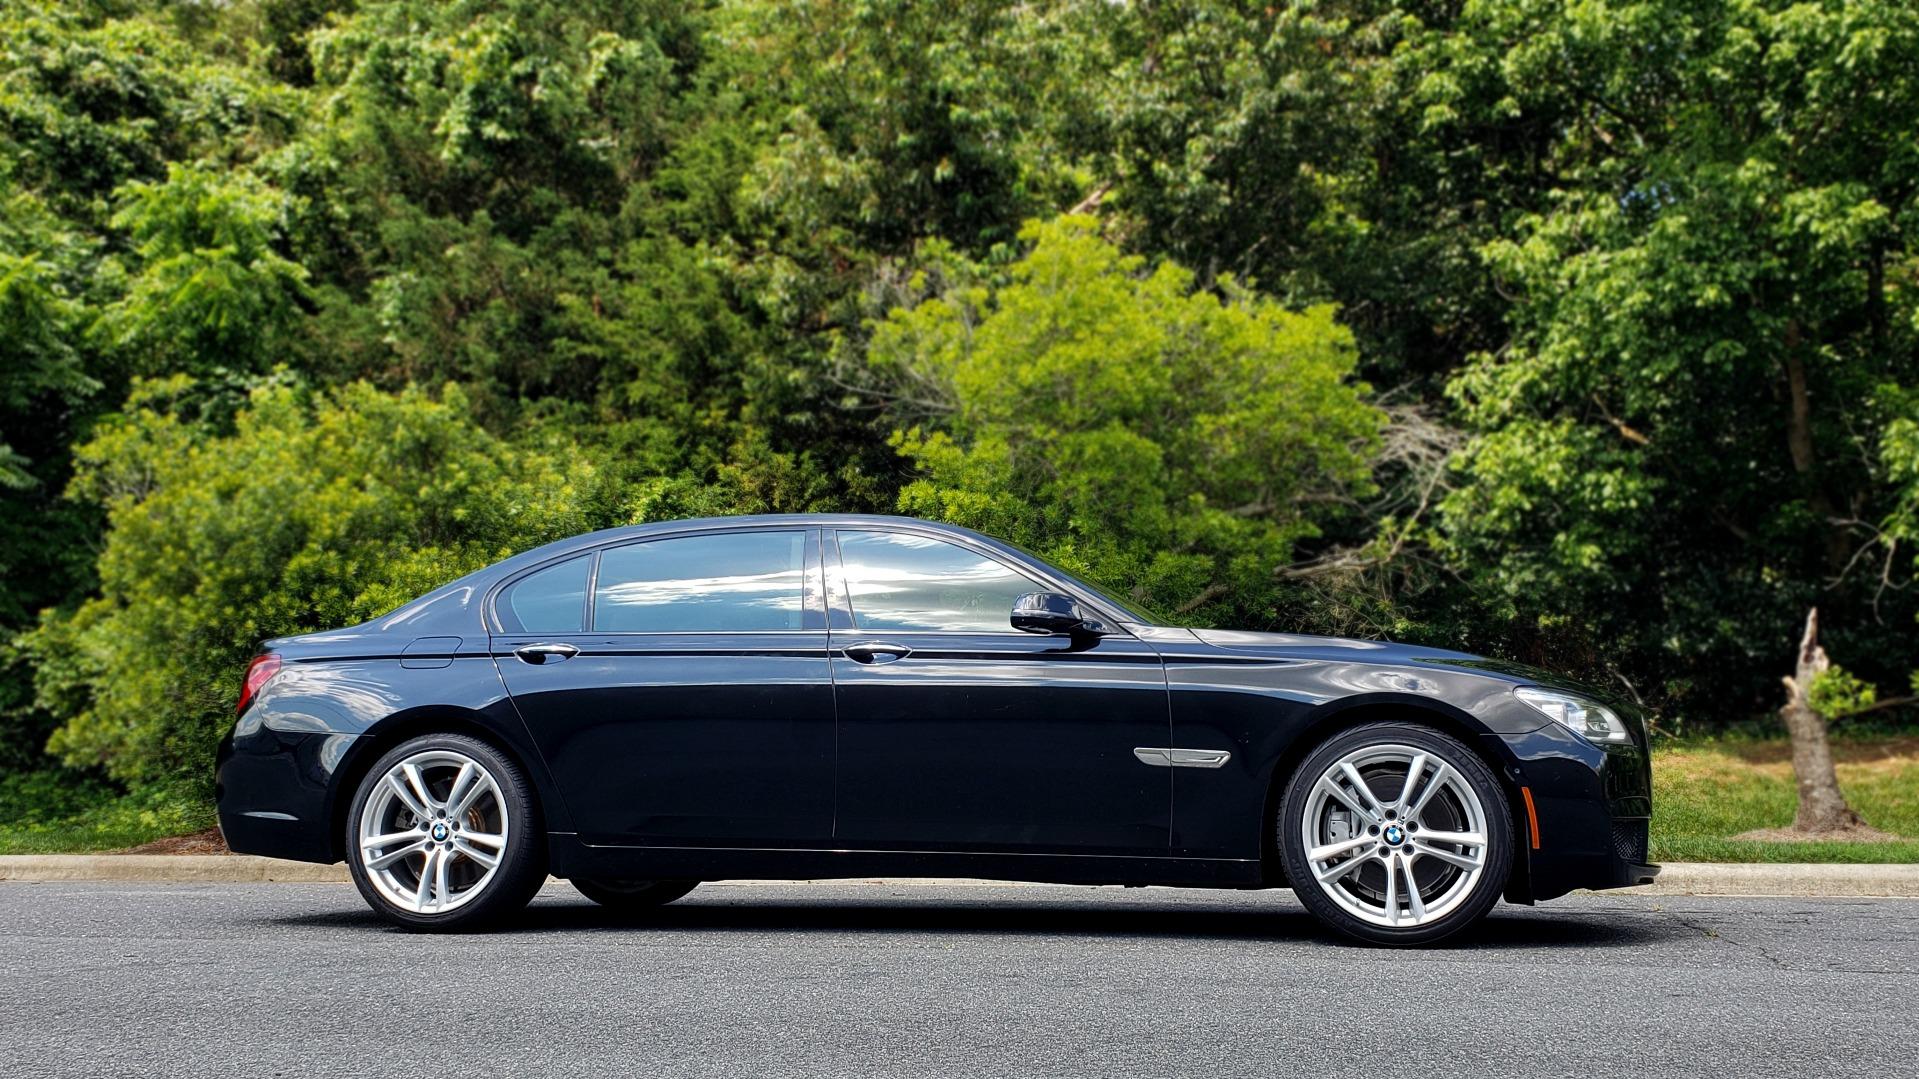 Used 2014 BMW 7 SERIES 750LI M-SPORT / EXEC PKG / DRVR ASST / LIGHTING / NAV / SUNROOF for sale Sold at Formula Imports in Charlotte NC 28227 5